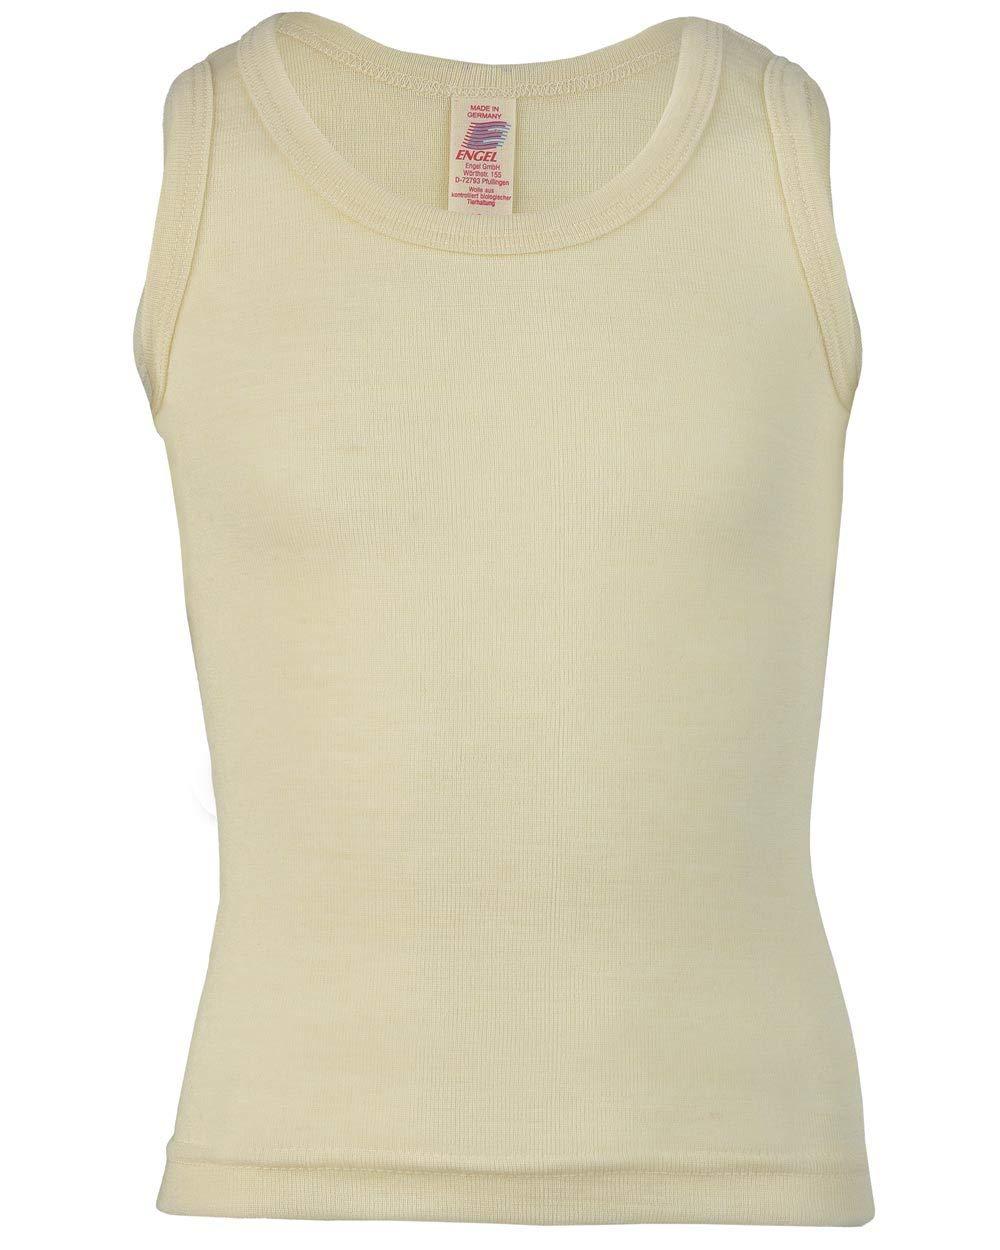 Engel Children's 100% Organic Merino Wool Vest Sleeveless